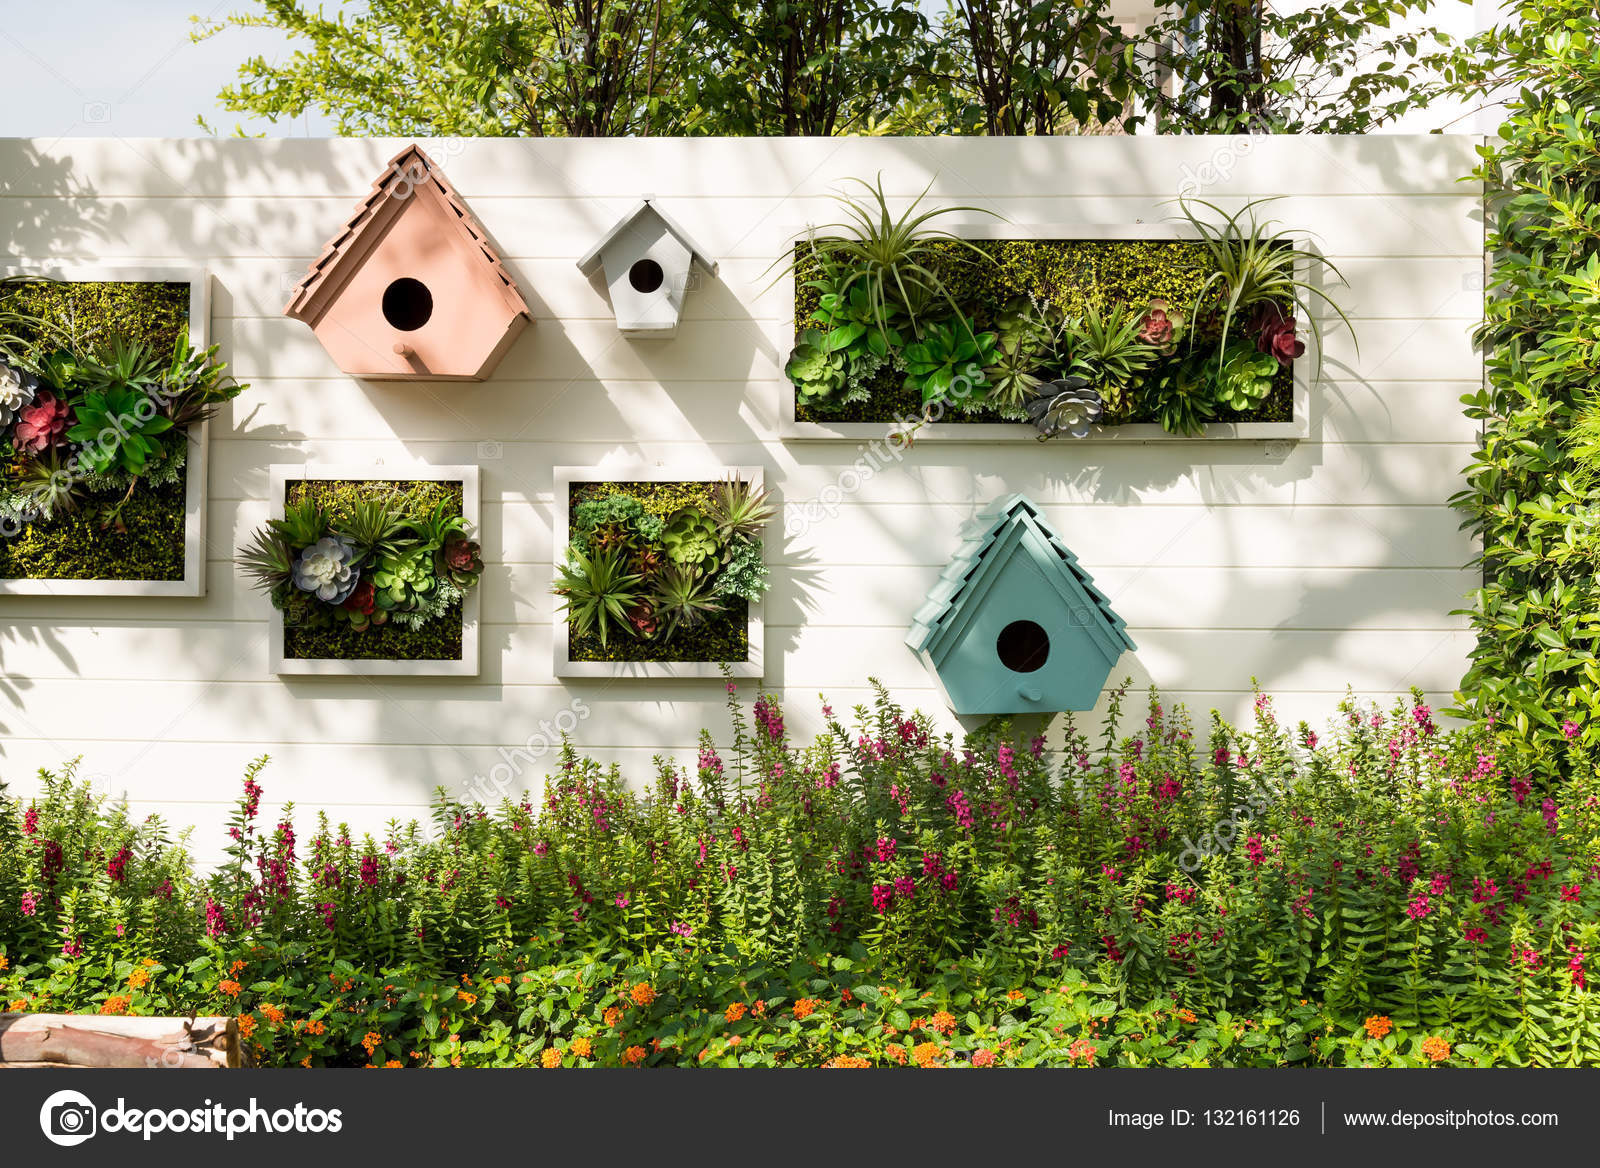 Muur Ideeen Tuin : Gedecoreerde muur verticale tuin achtergrond u2014 stockfoto